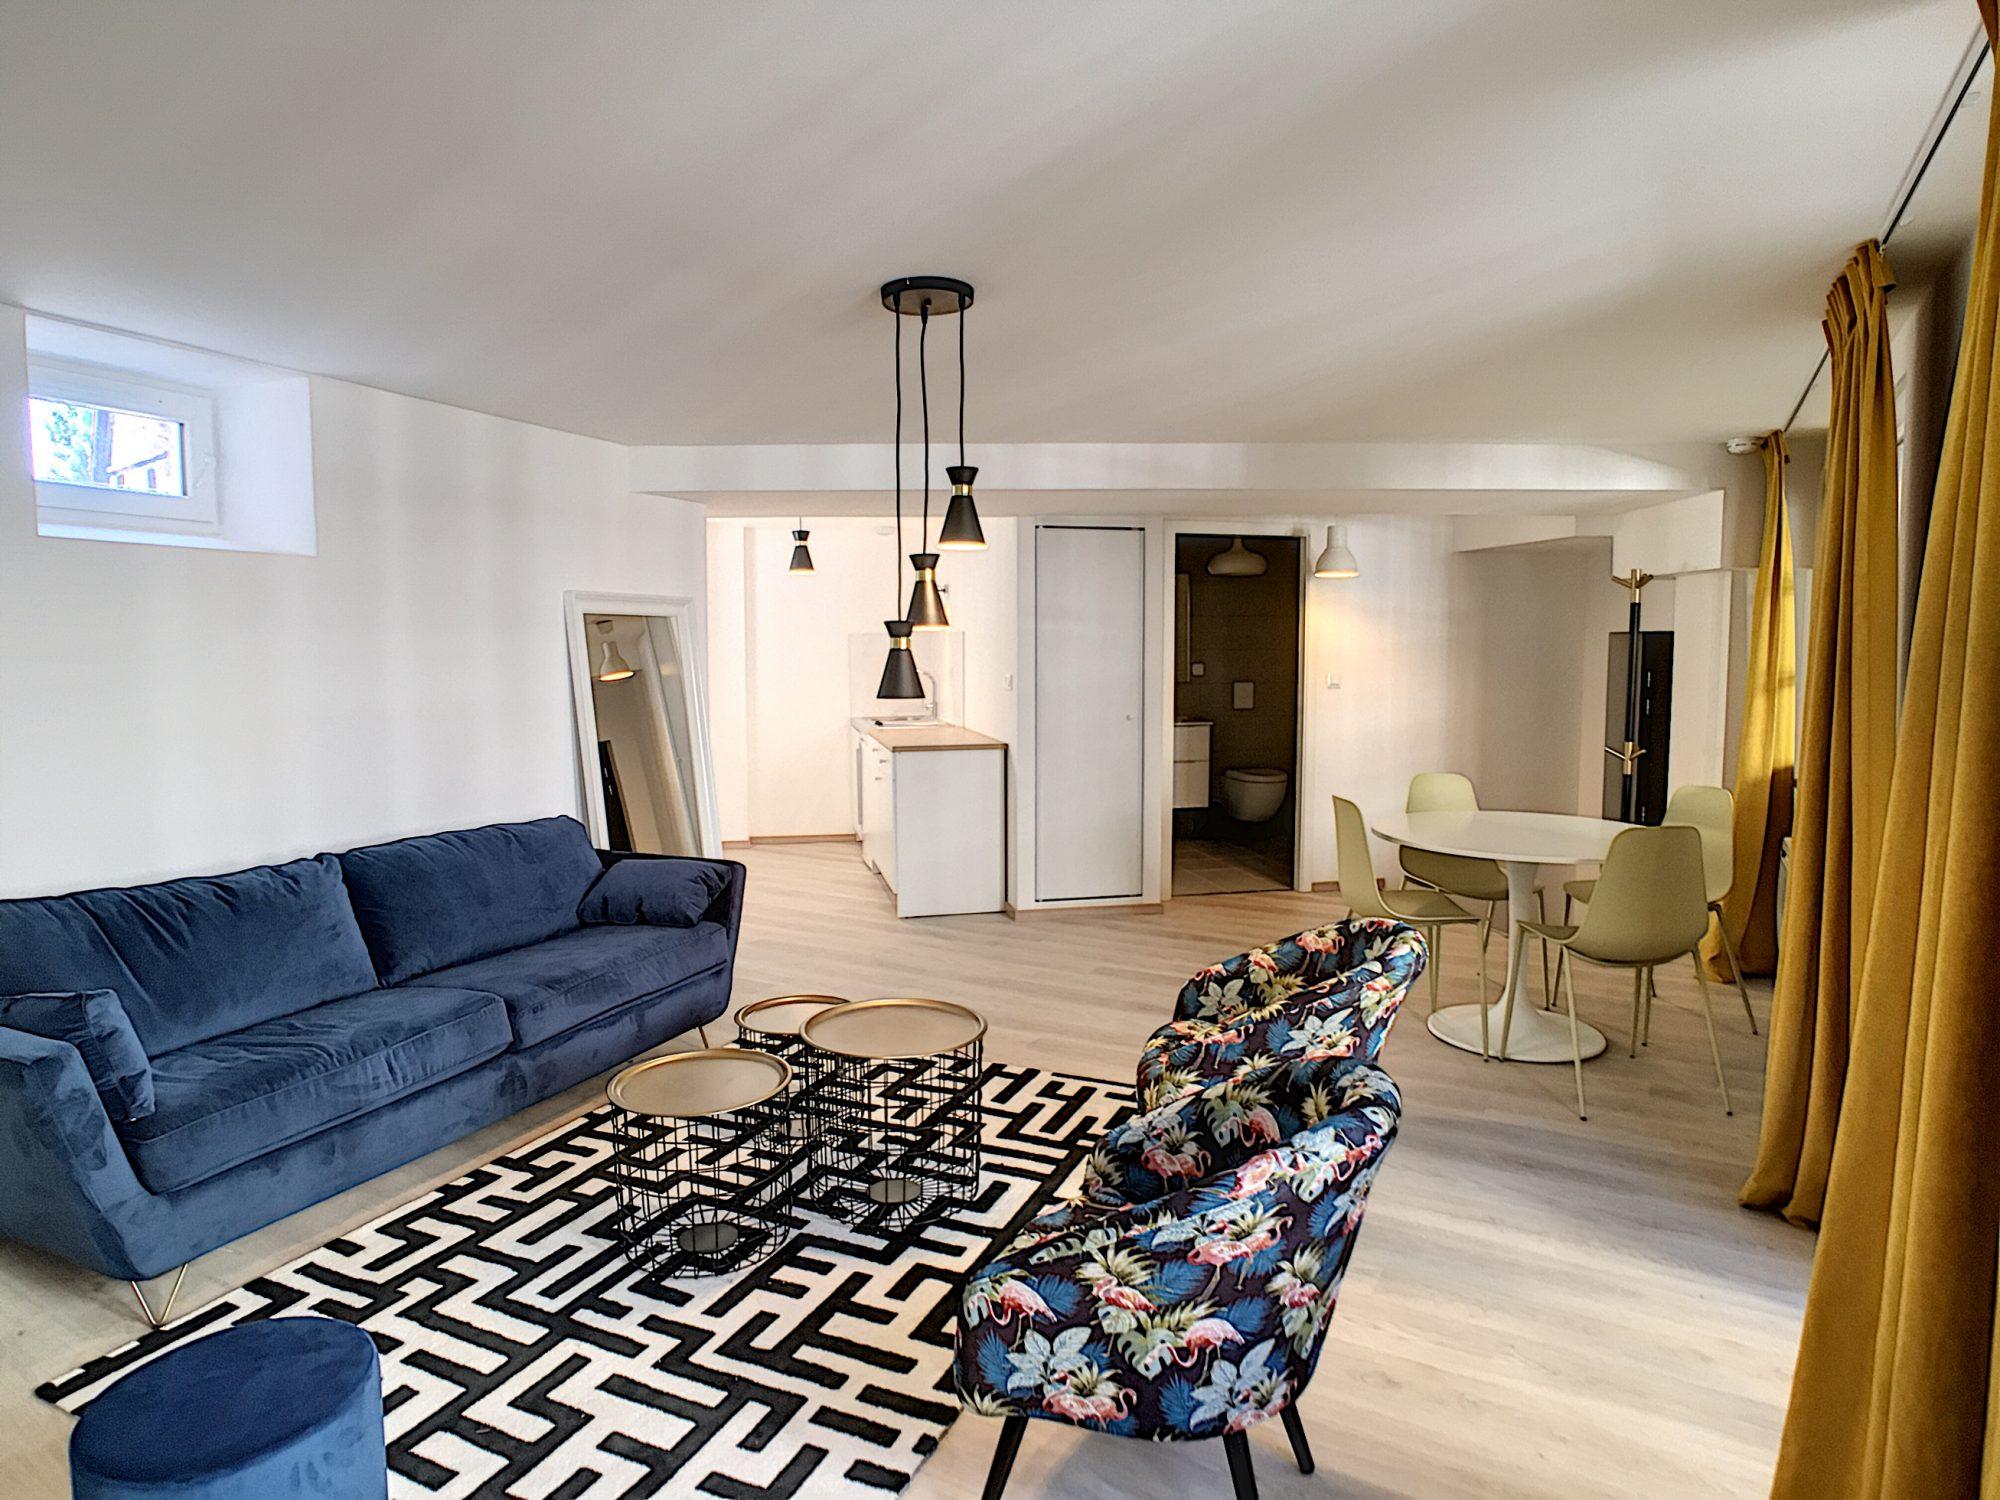 [Atypique] Splendide 2 pièces meublé avec terrasse – Petite France / quai Turckheim - nos locations - Beausite Immobilier 2